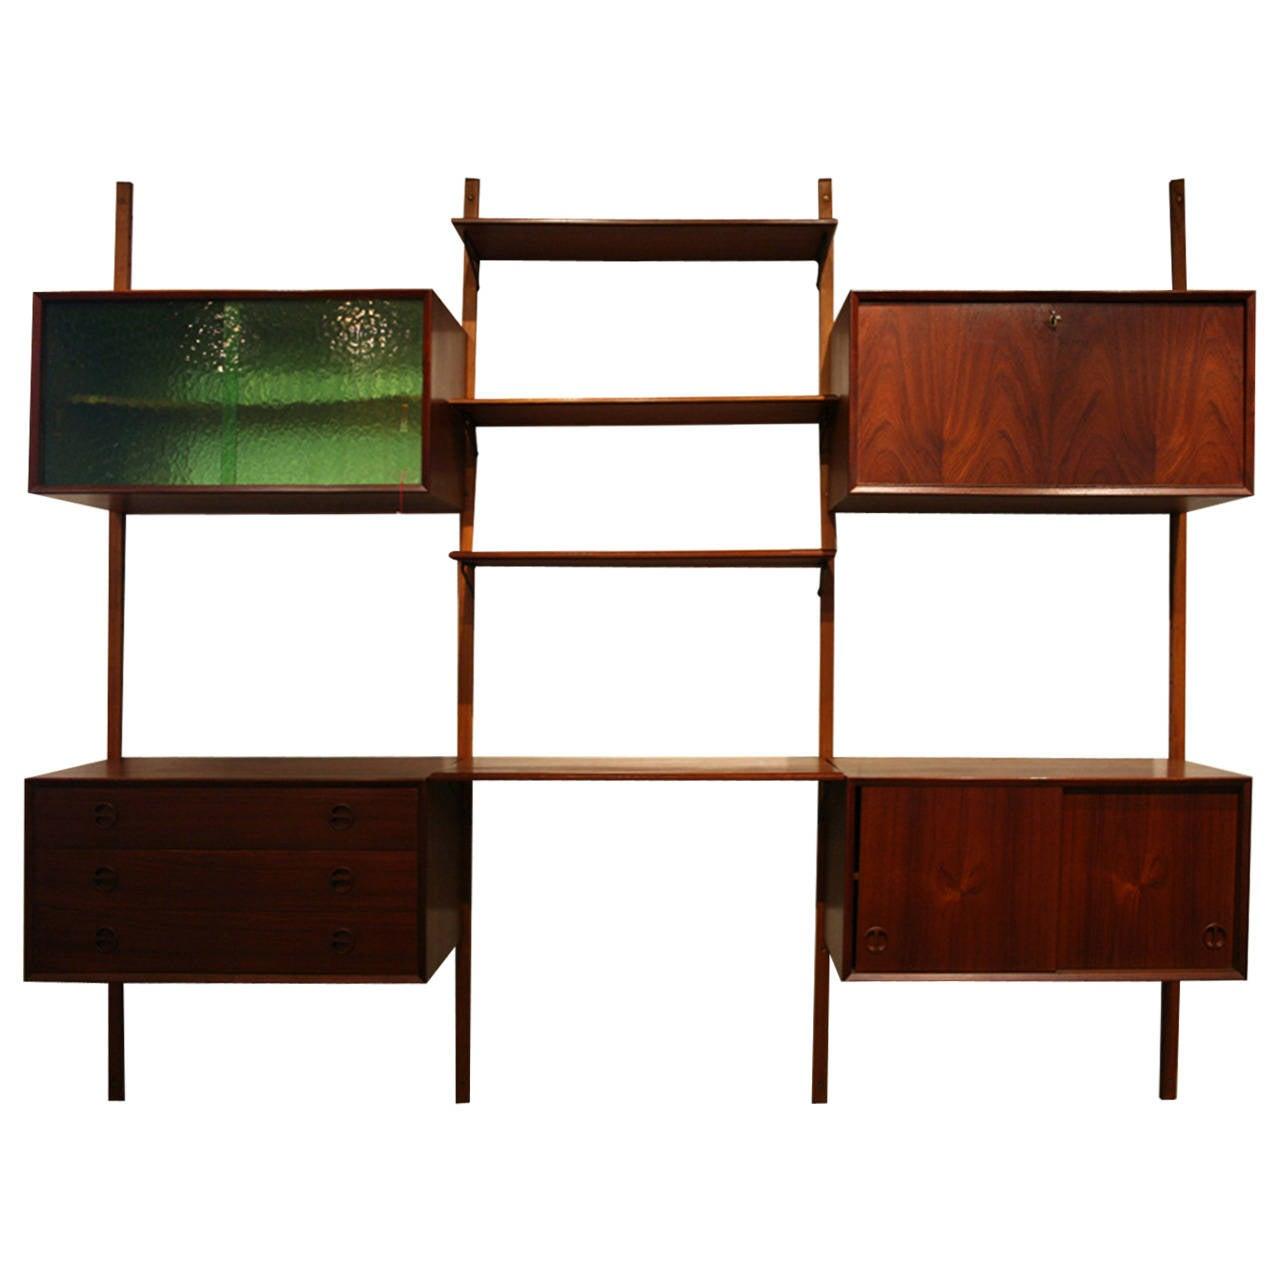 danish mid century modern teak wall system shelving bar. Black Bedroom Furniture Sets. Home Design Ideas